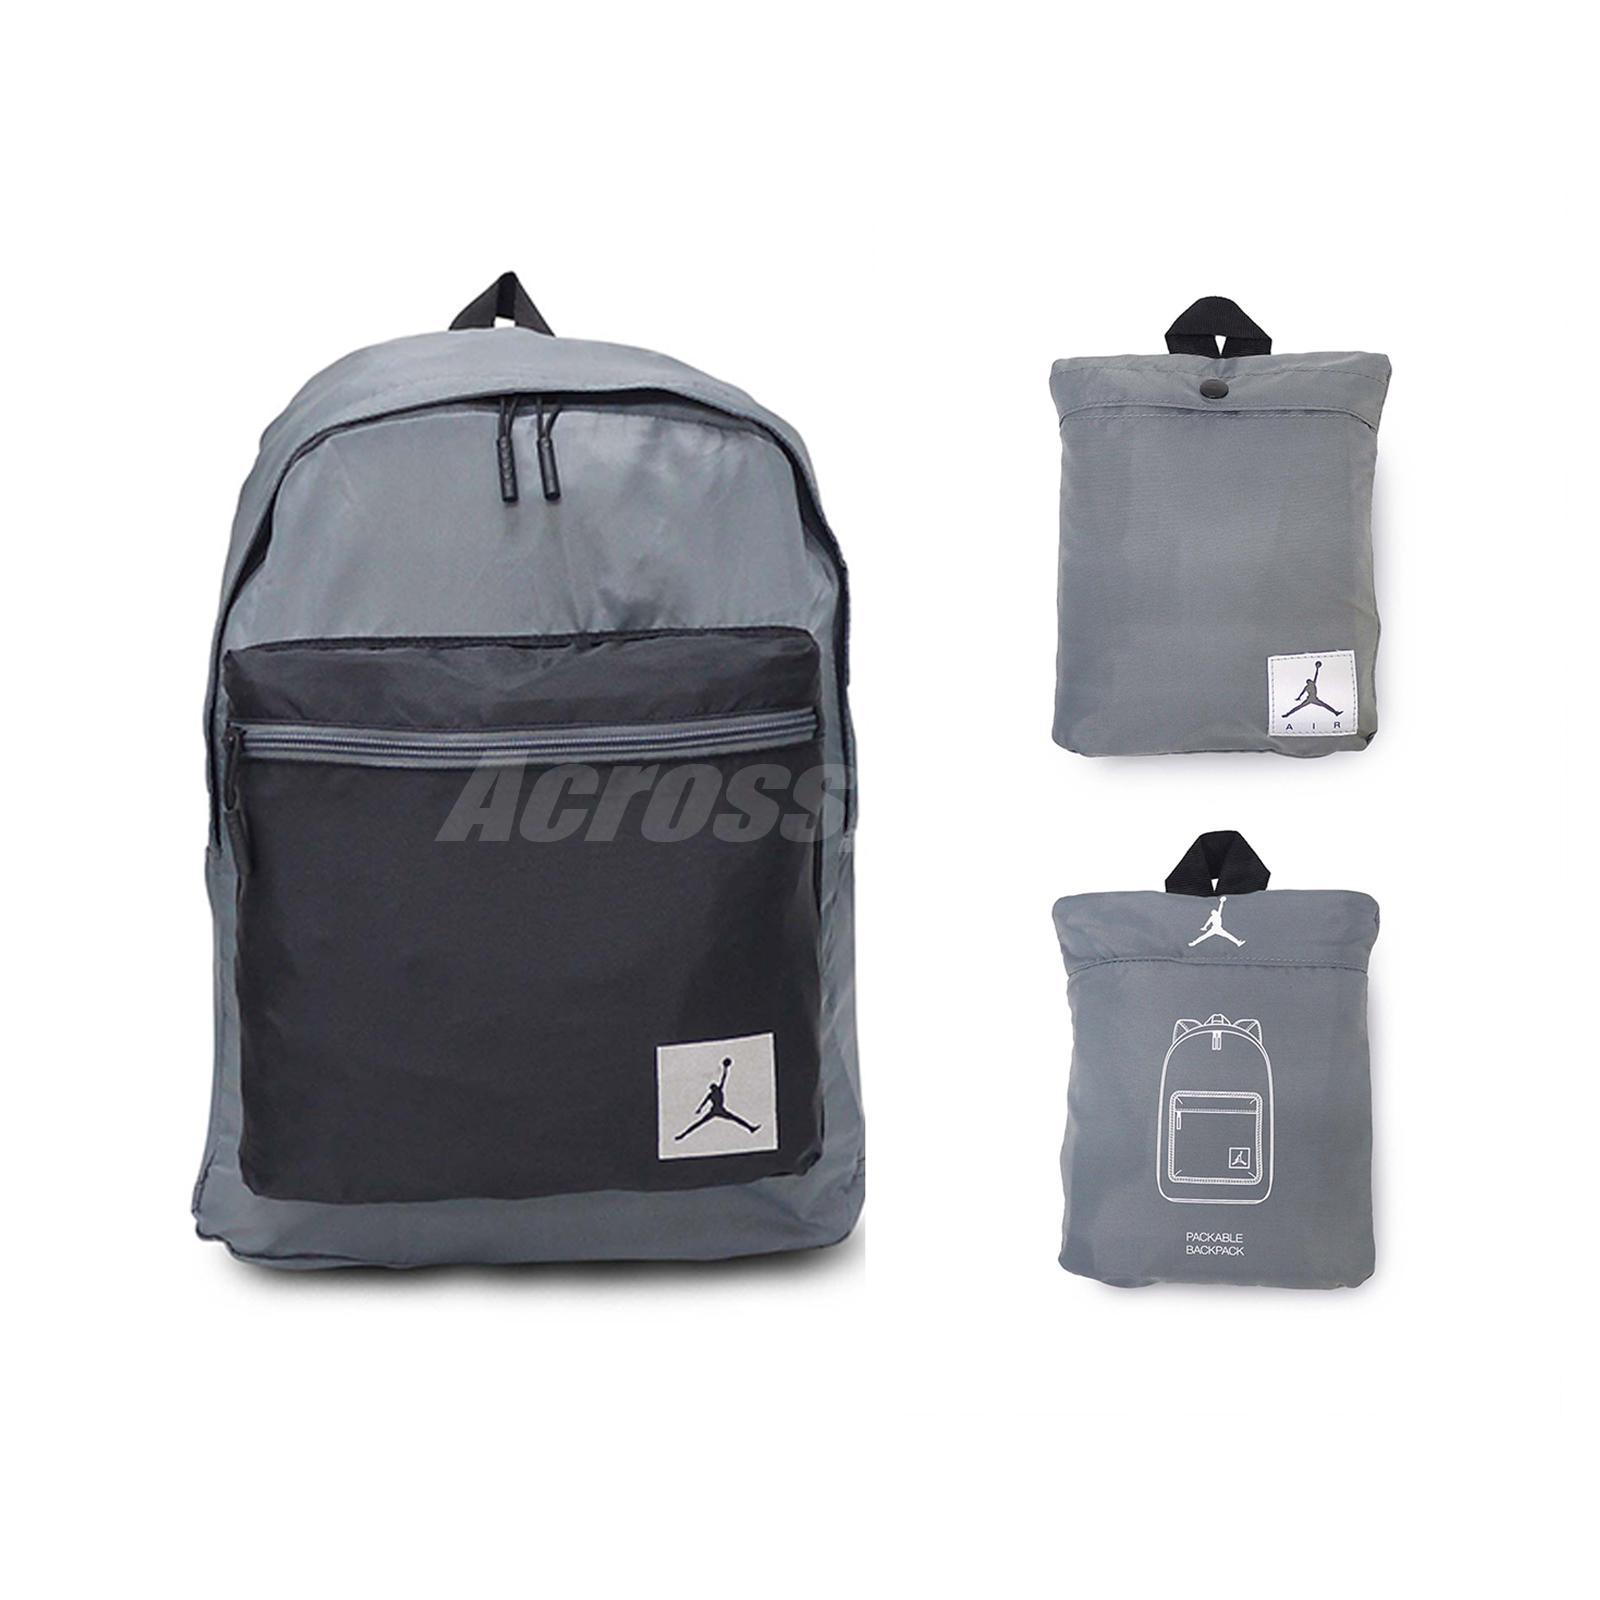 Details about Nike Jordan Skyline Flight Mini Packable Grey Black Travel  Backpack 9A0014-G3X 316e03ea78a92